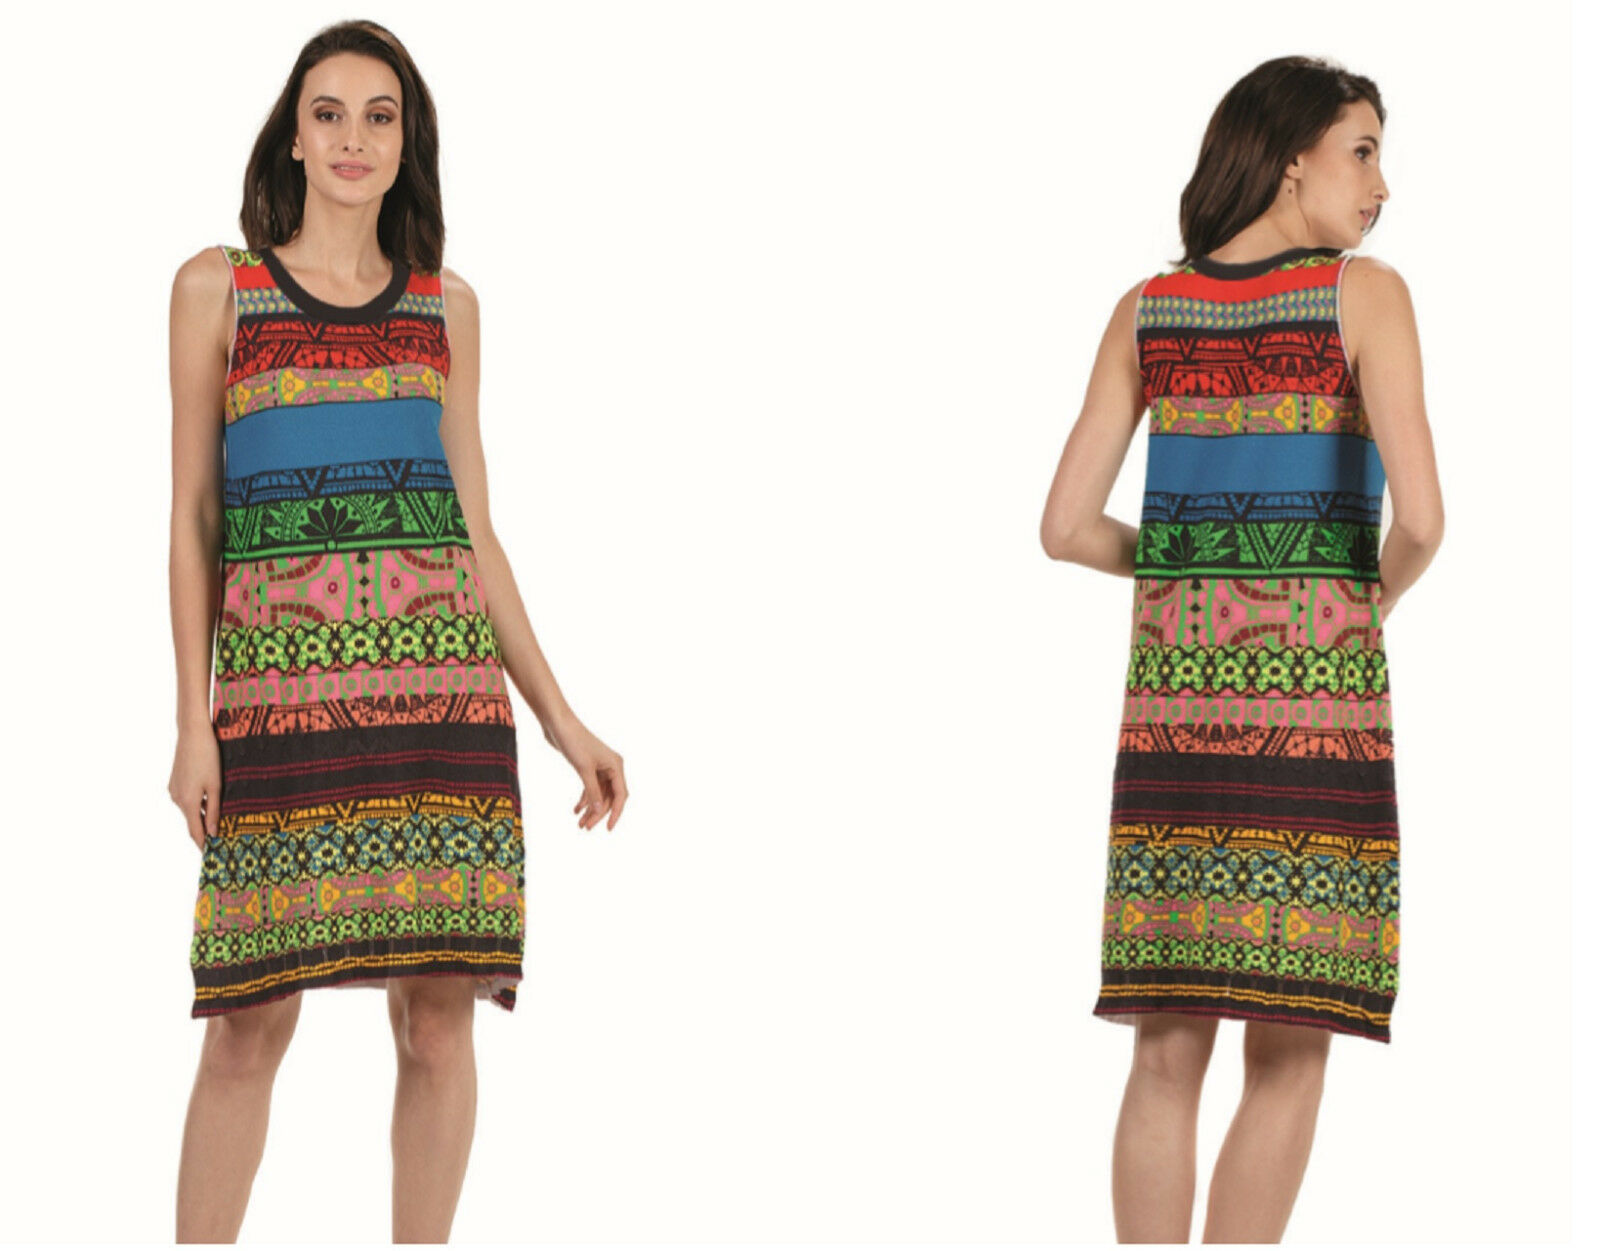 KOOI knitwear Stretch Print-Kleid dress multicolor bunt DC Iv-KO 18011